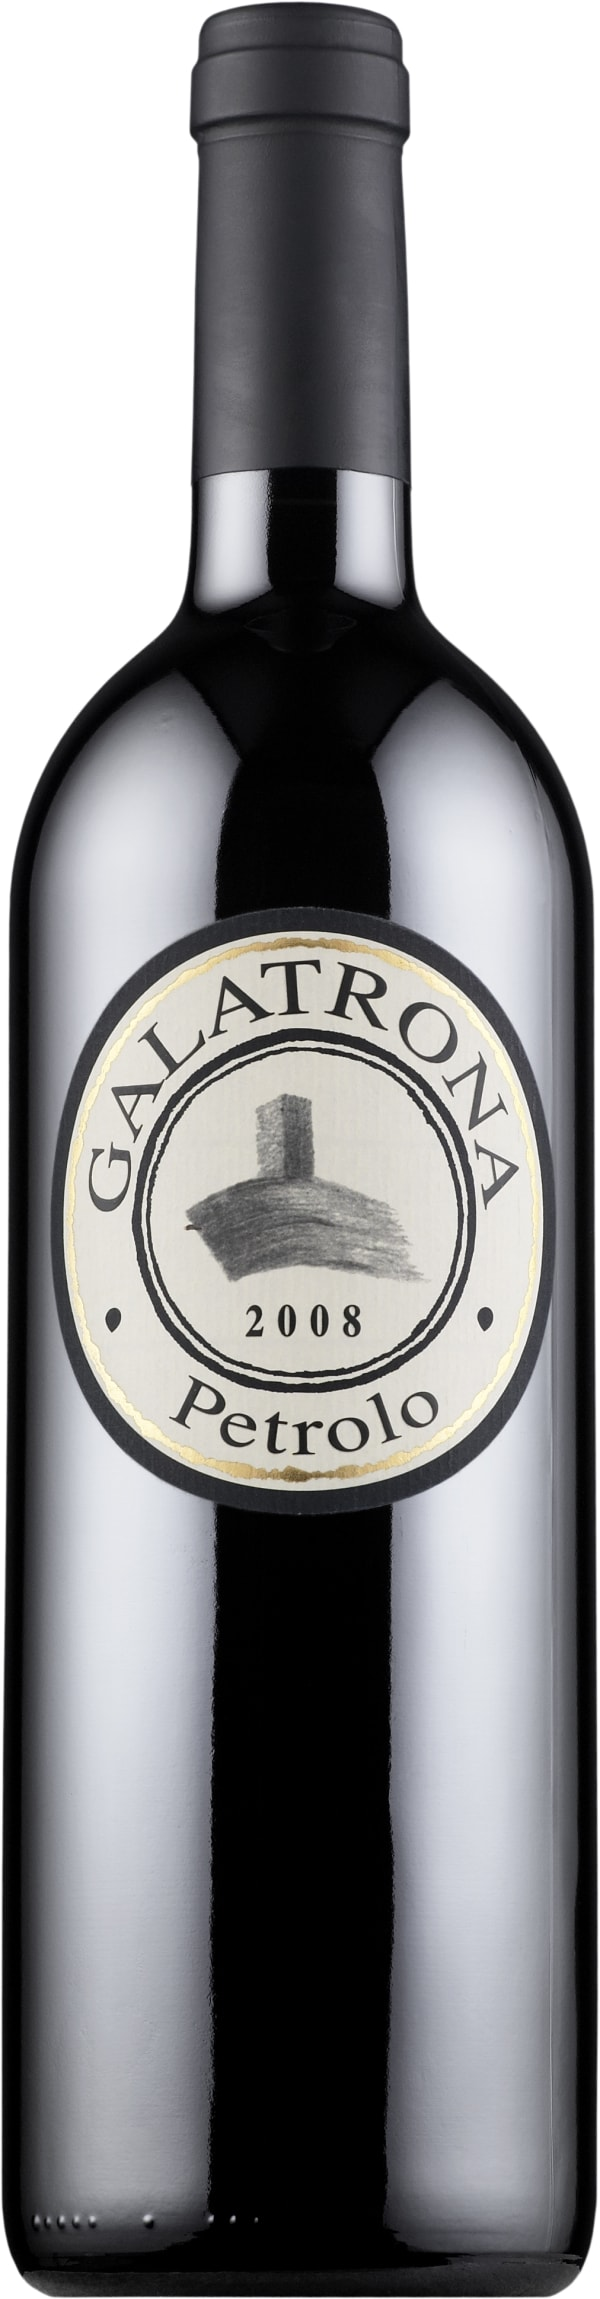 Petrolo Galatrona 2013